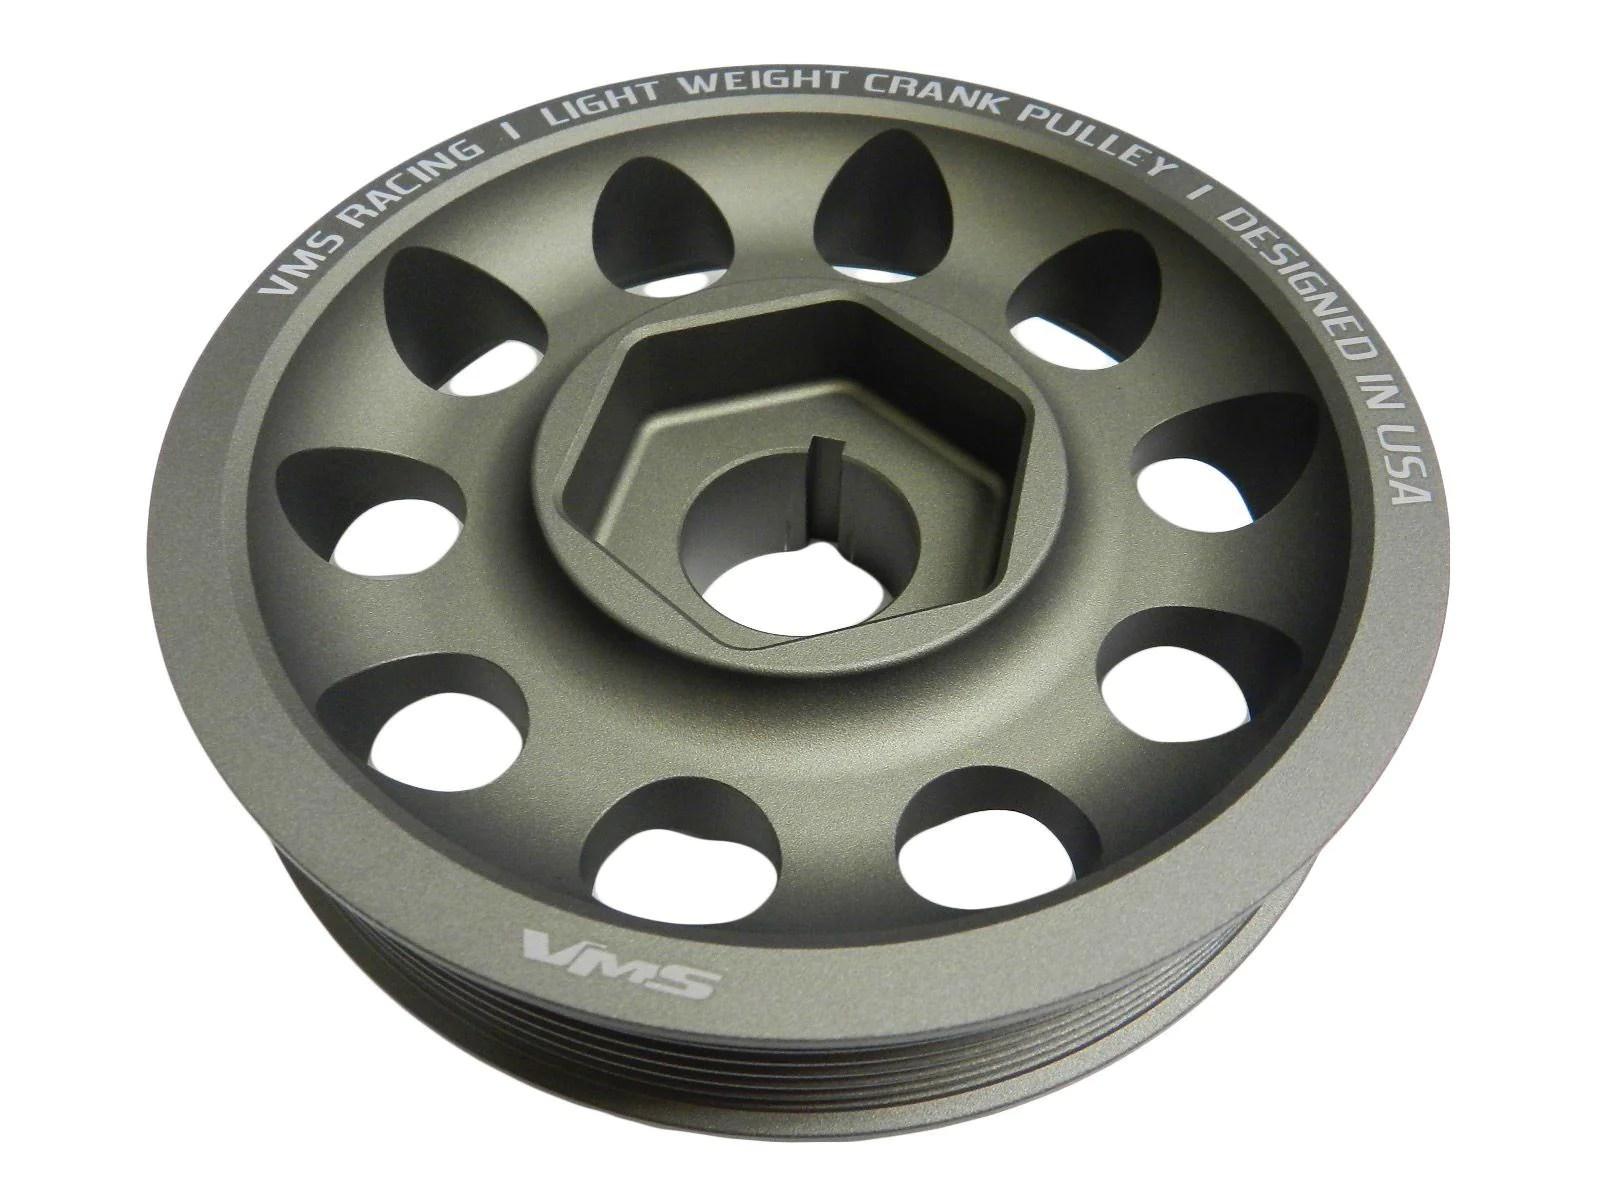 hight resolution of 02 04 acura rsx type s light weight oem size aluminum crankshaft crank pulley